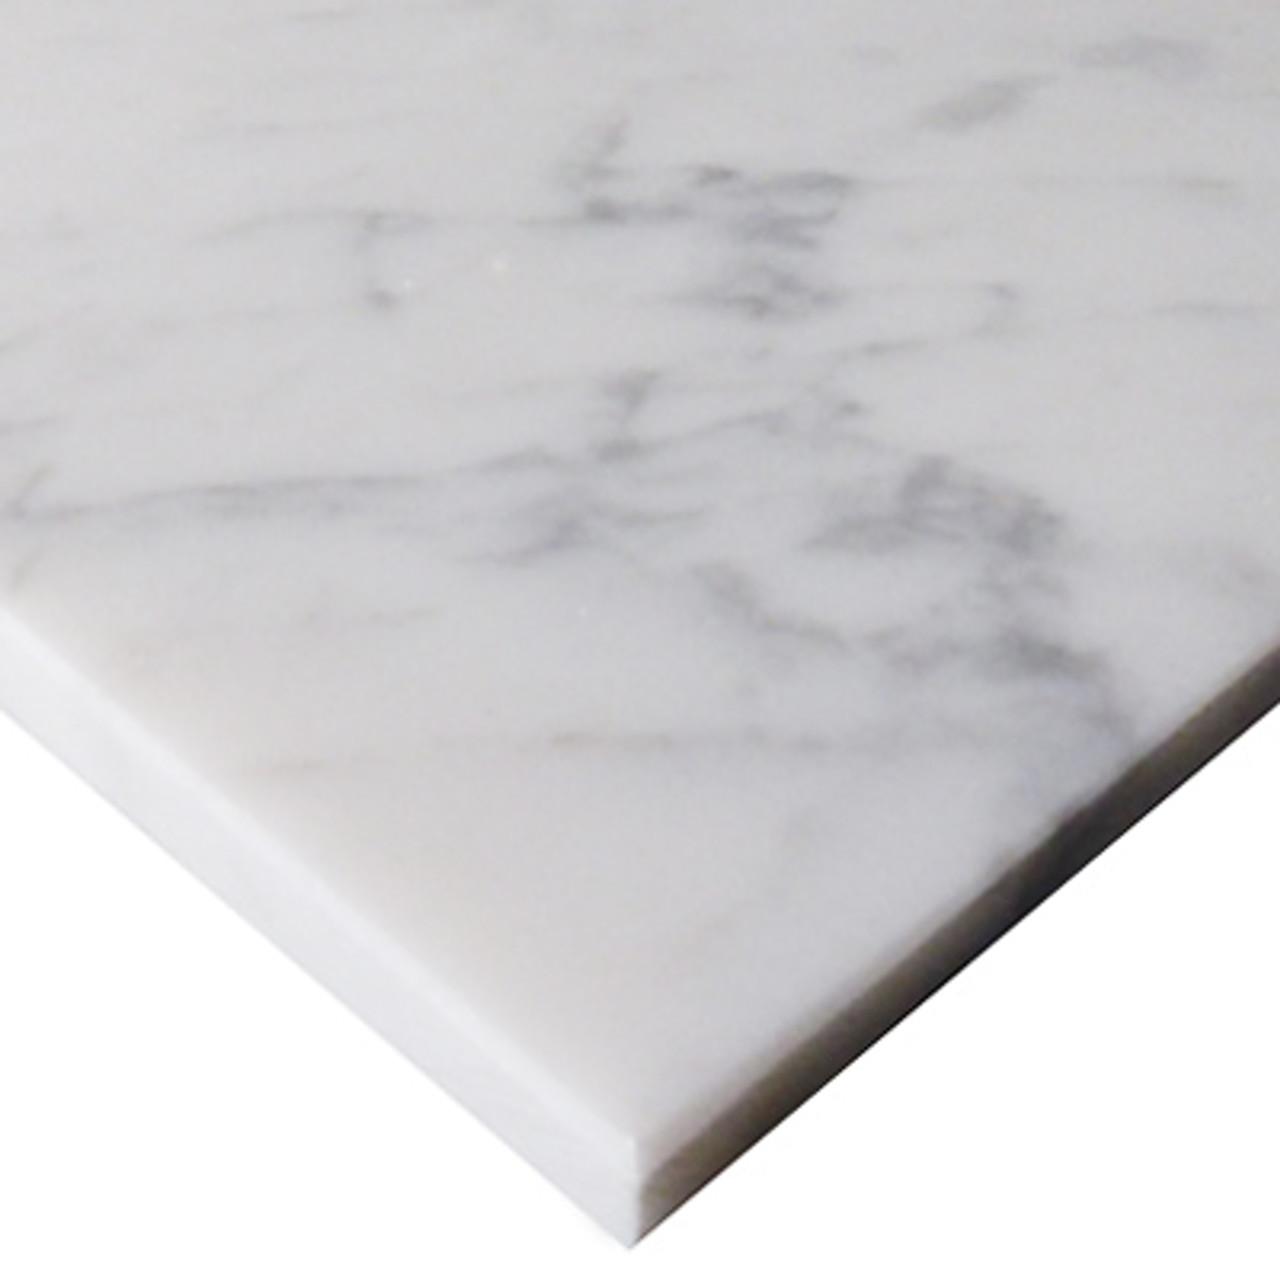 4 X 12 Carrara Marble Subway Tile Polished